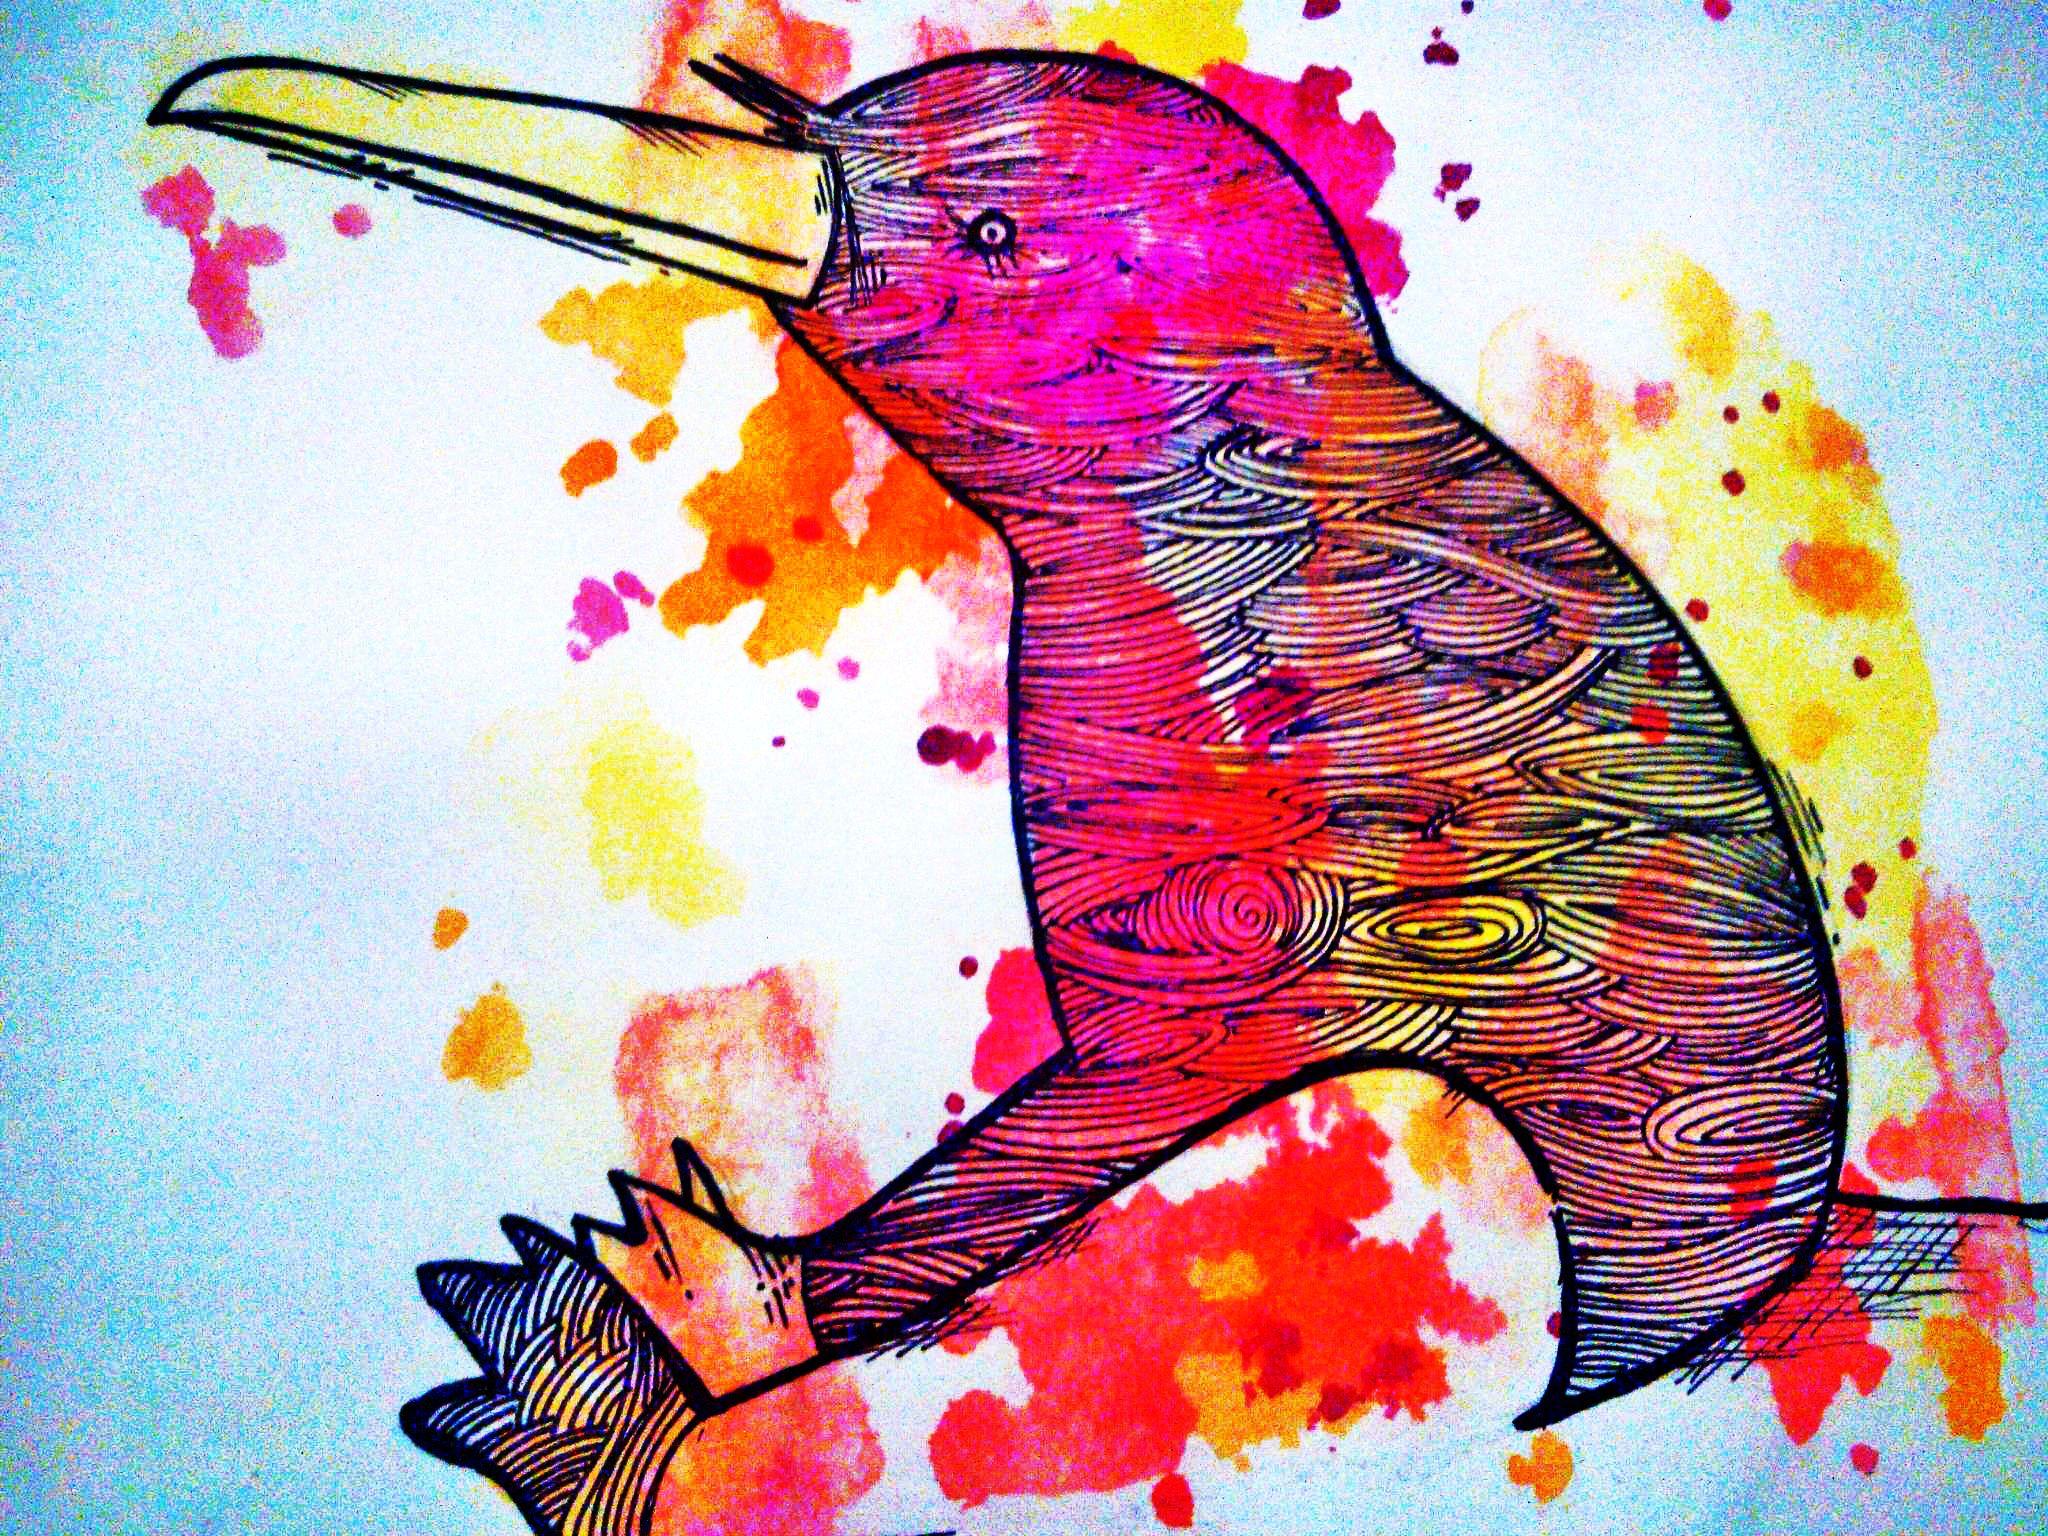 My work-Cristina Augello- KIWI BIRD